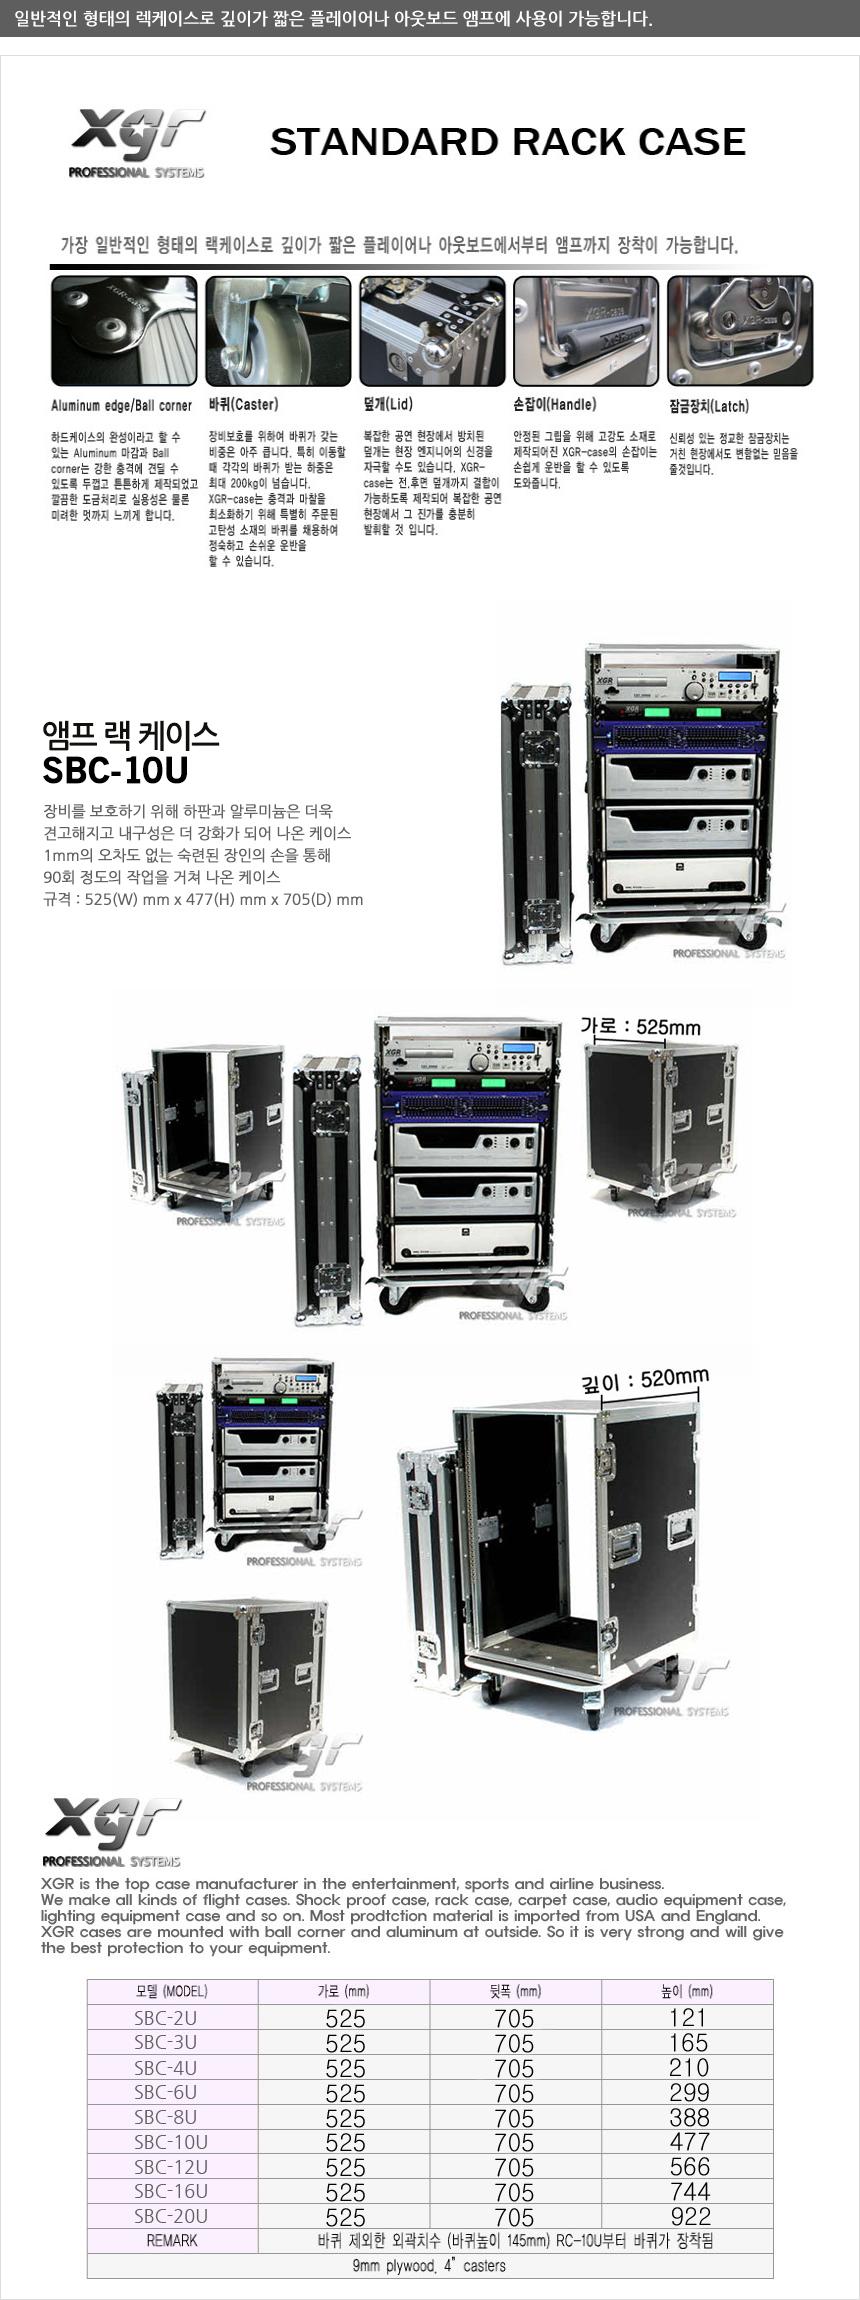 XGR/SBC10U/SBC-10U Rack Cases Rack Cases Wheels with front